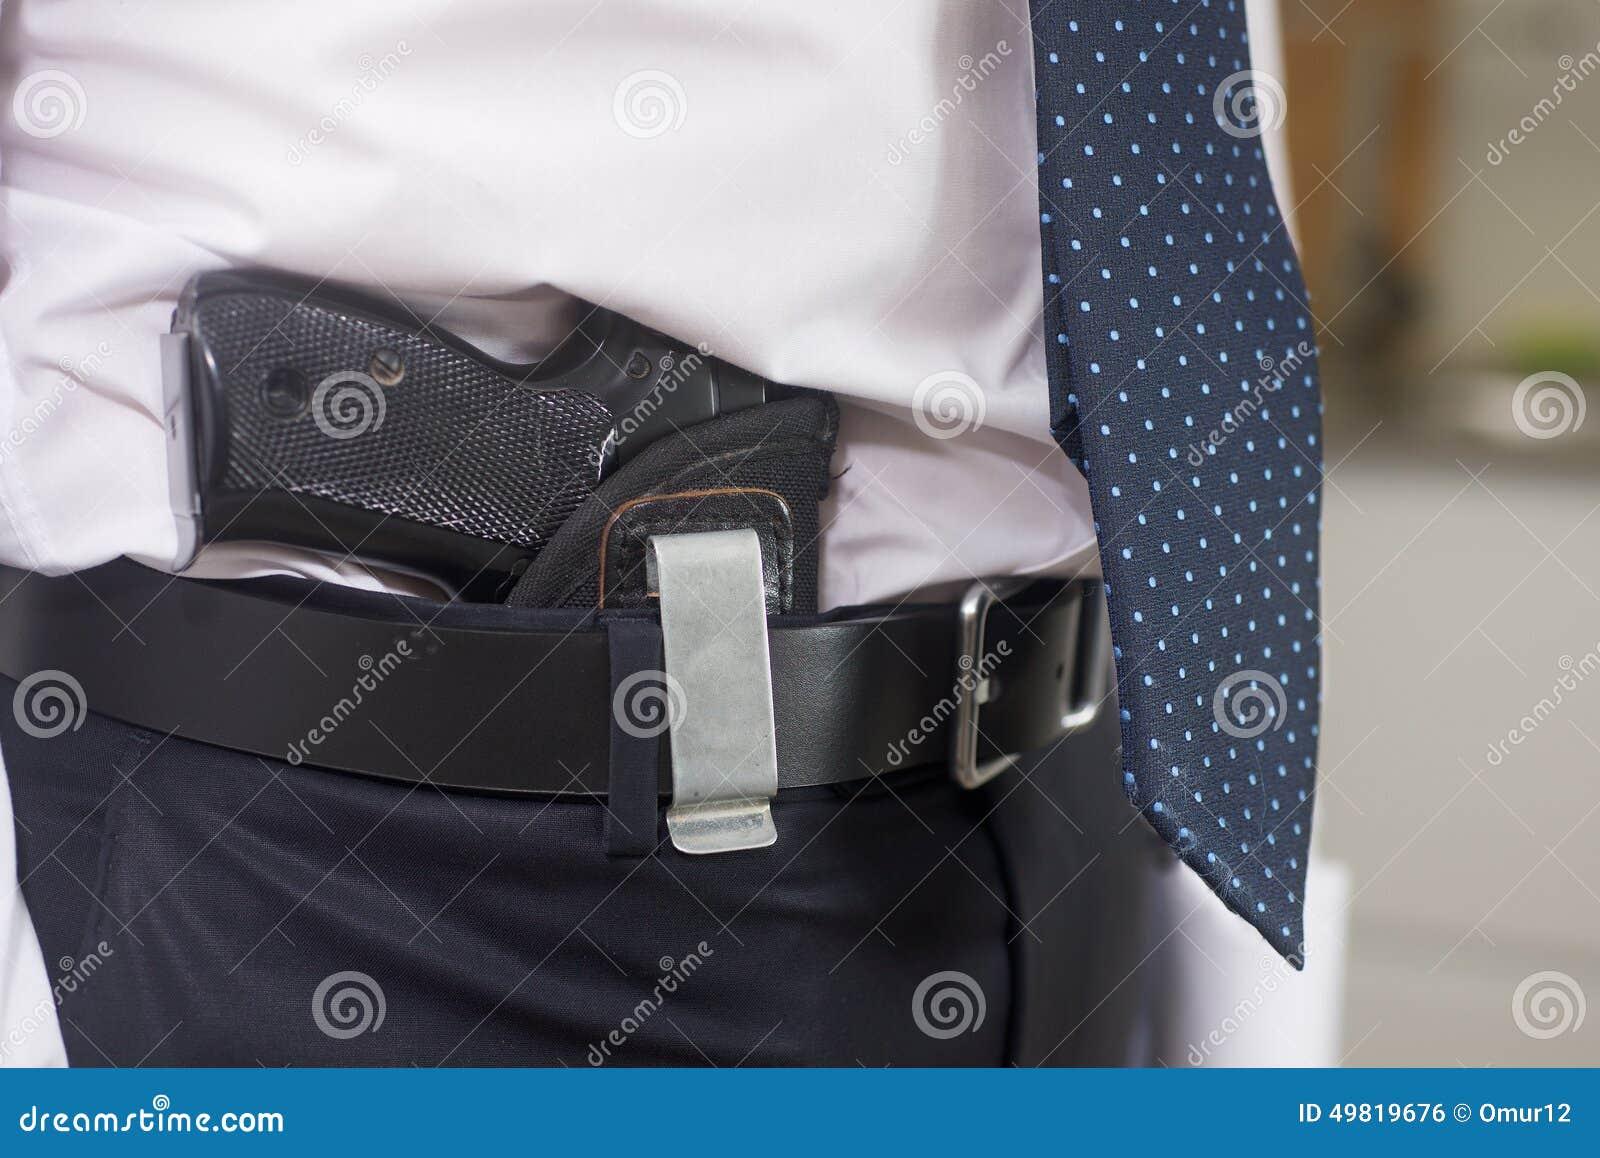 Bodyguard with gun stock photo. Image of male, mafia - 49819676